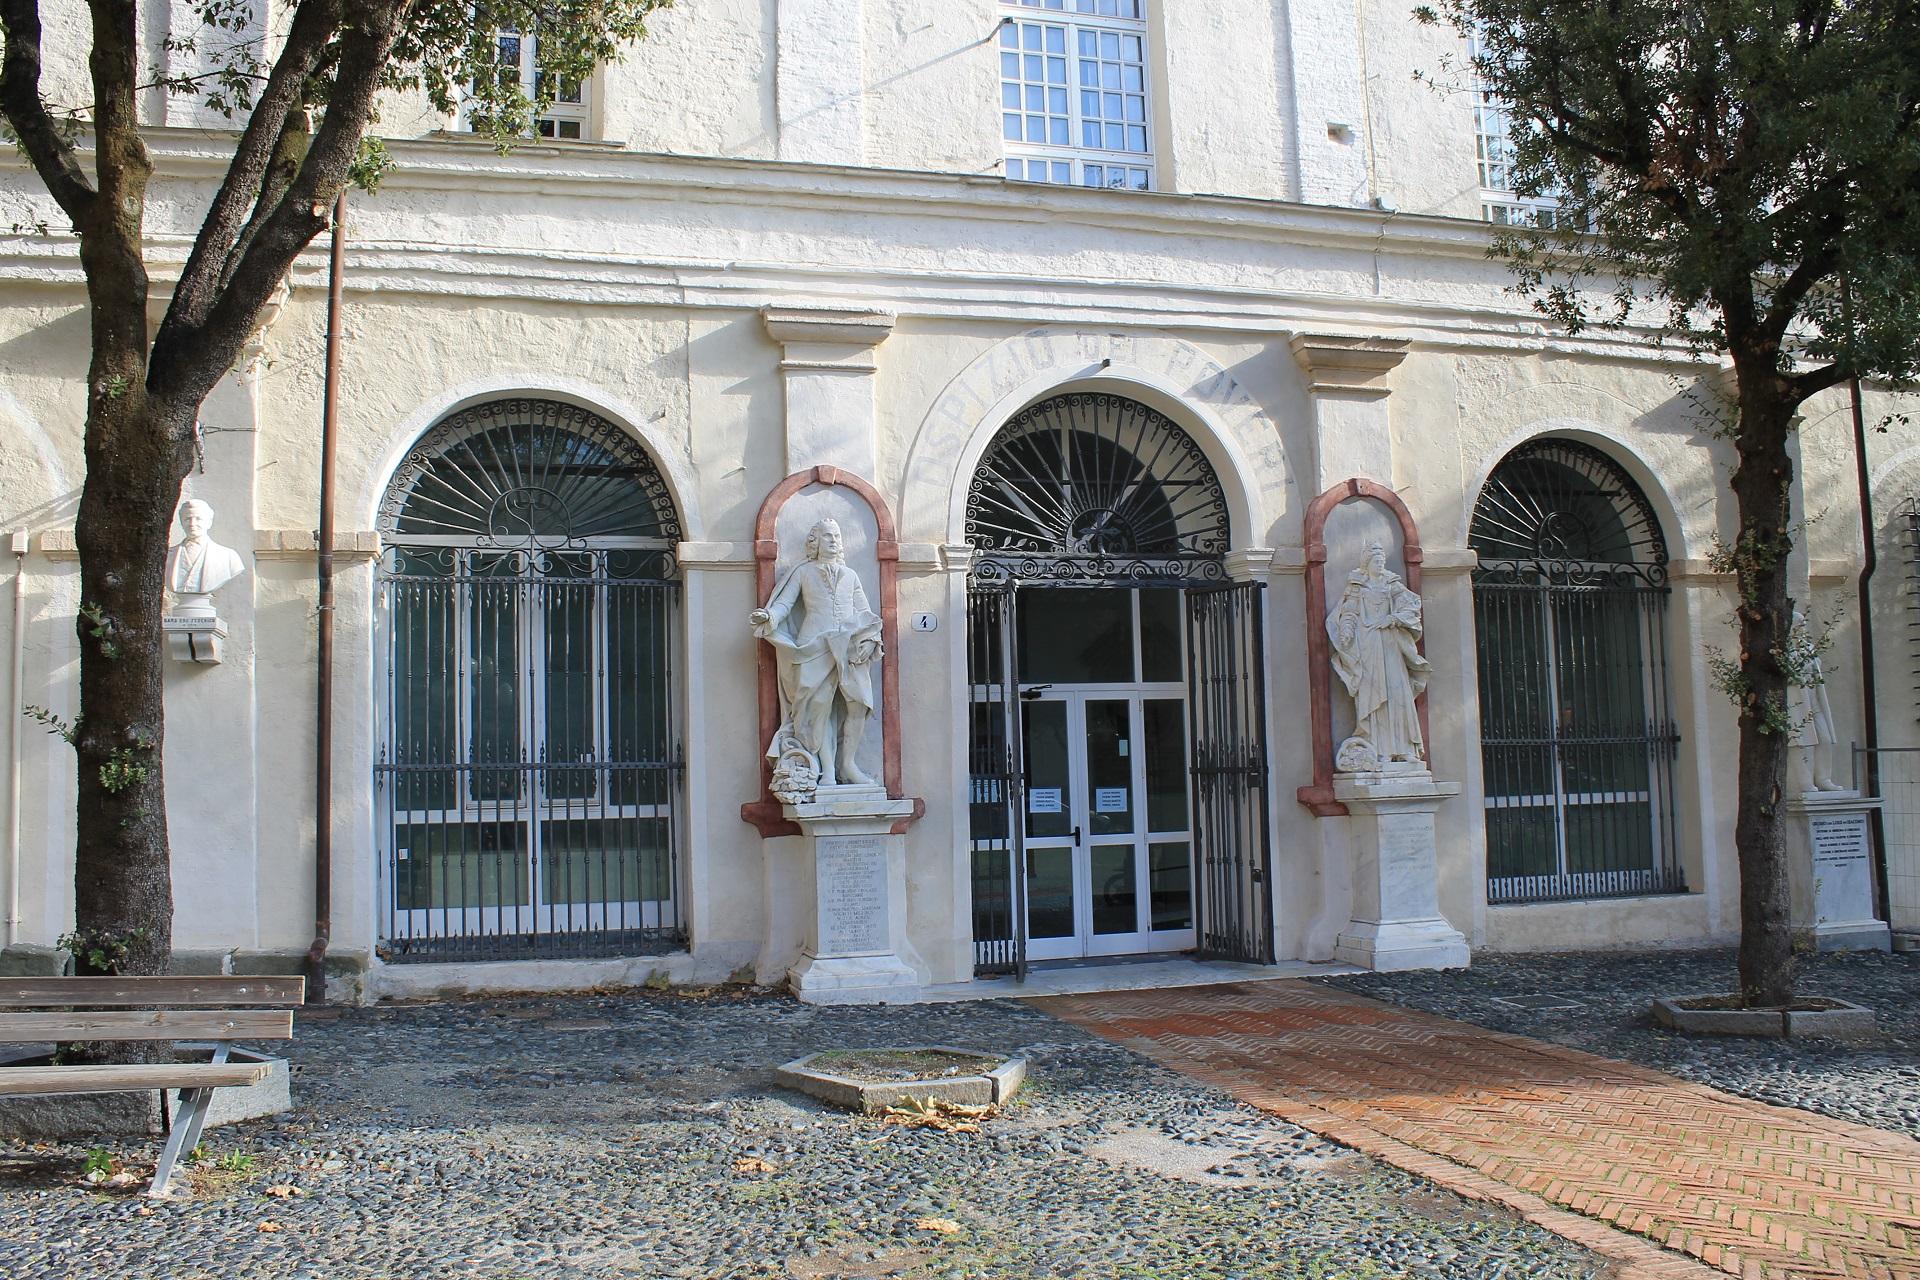 Residenza Protetta Santuario | Piazza Santuario 4 | Savona